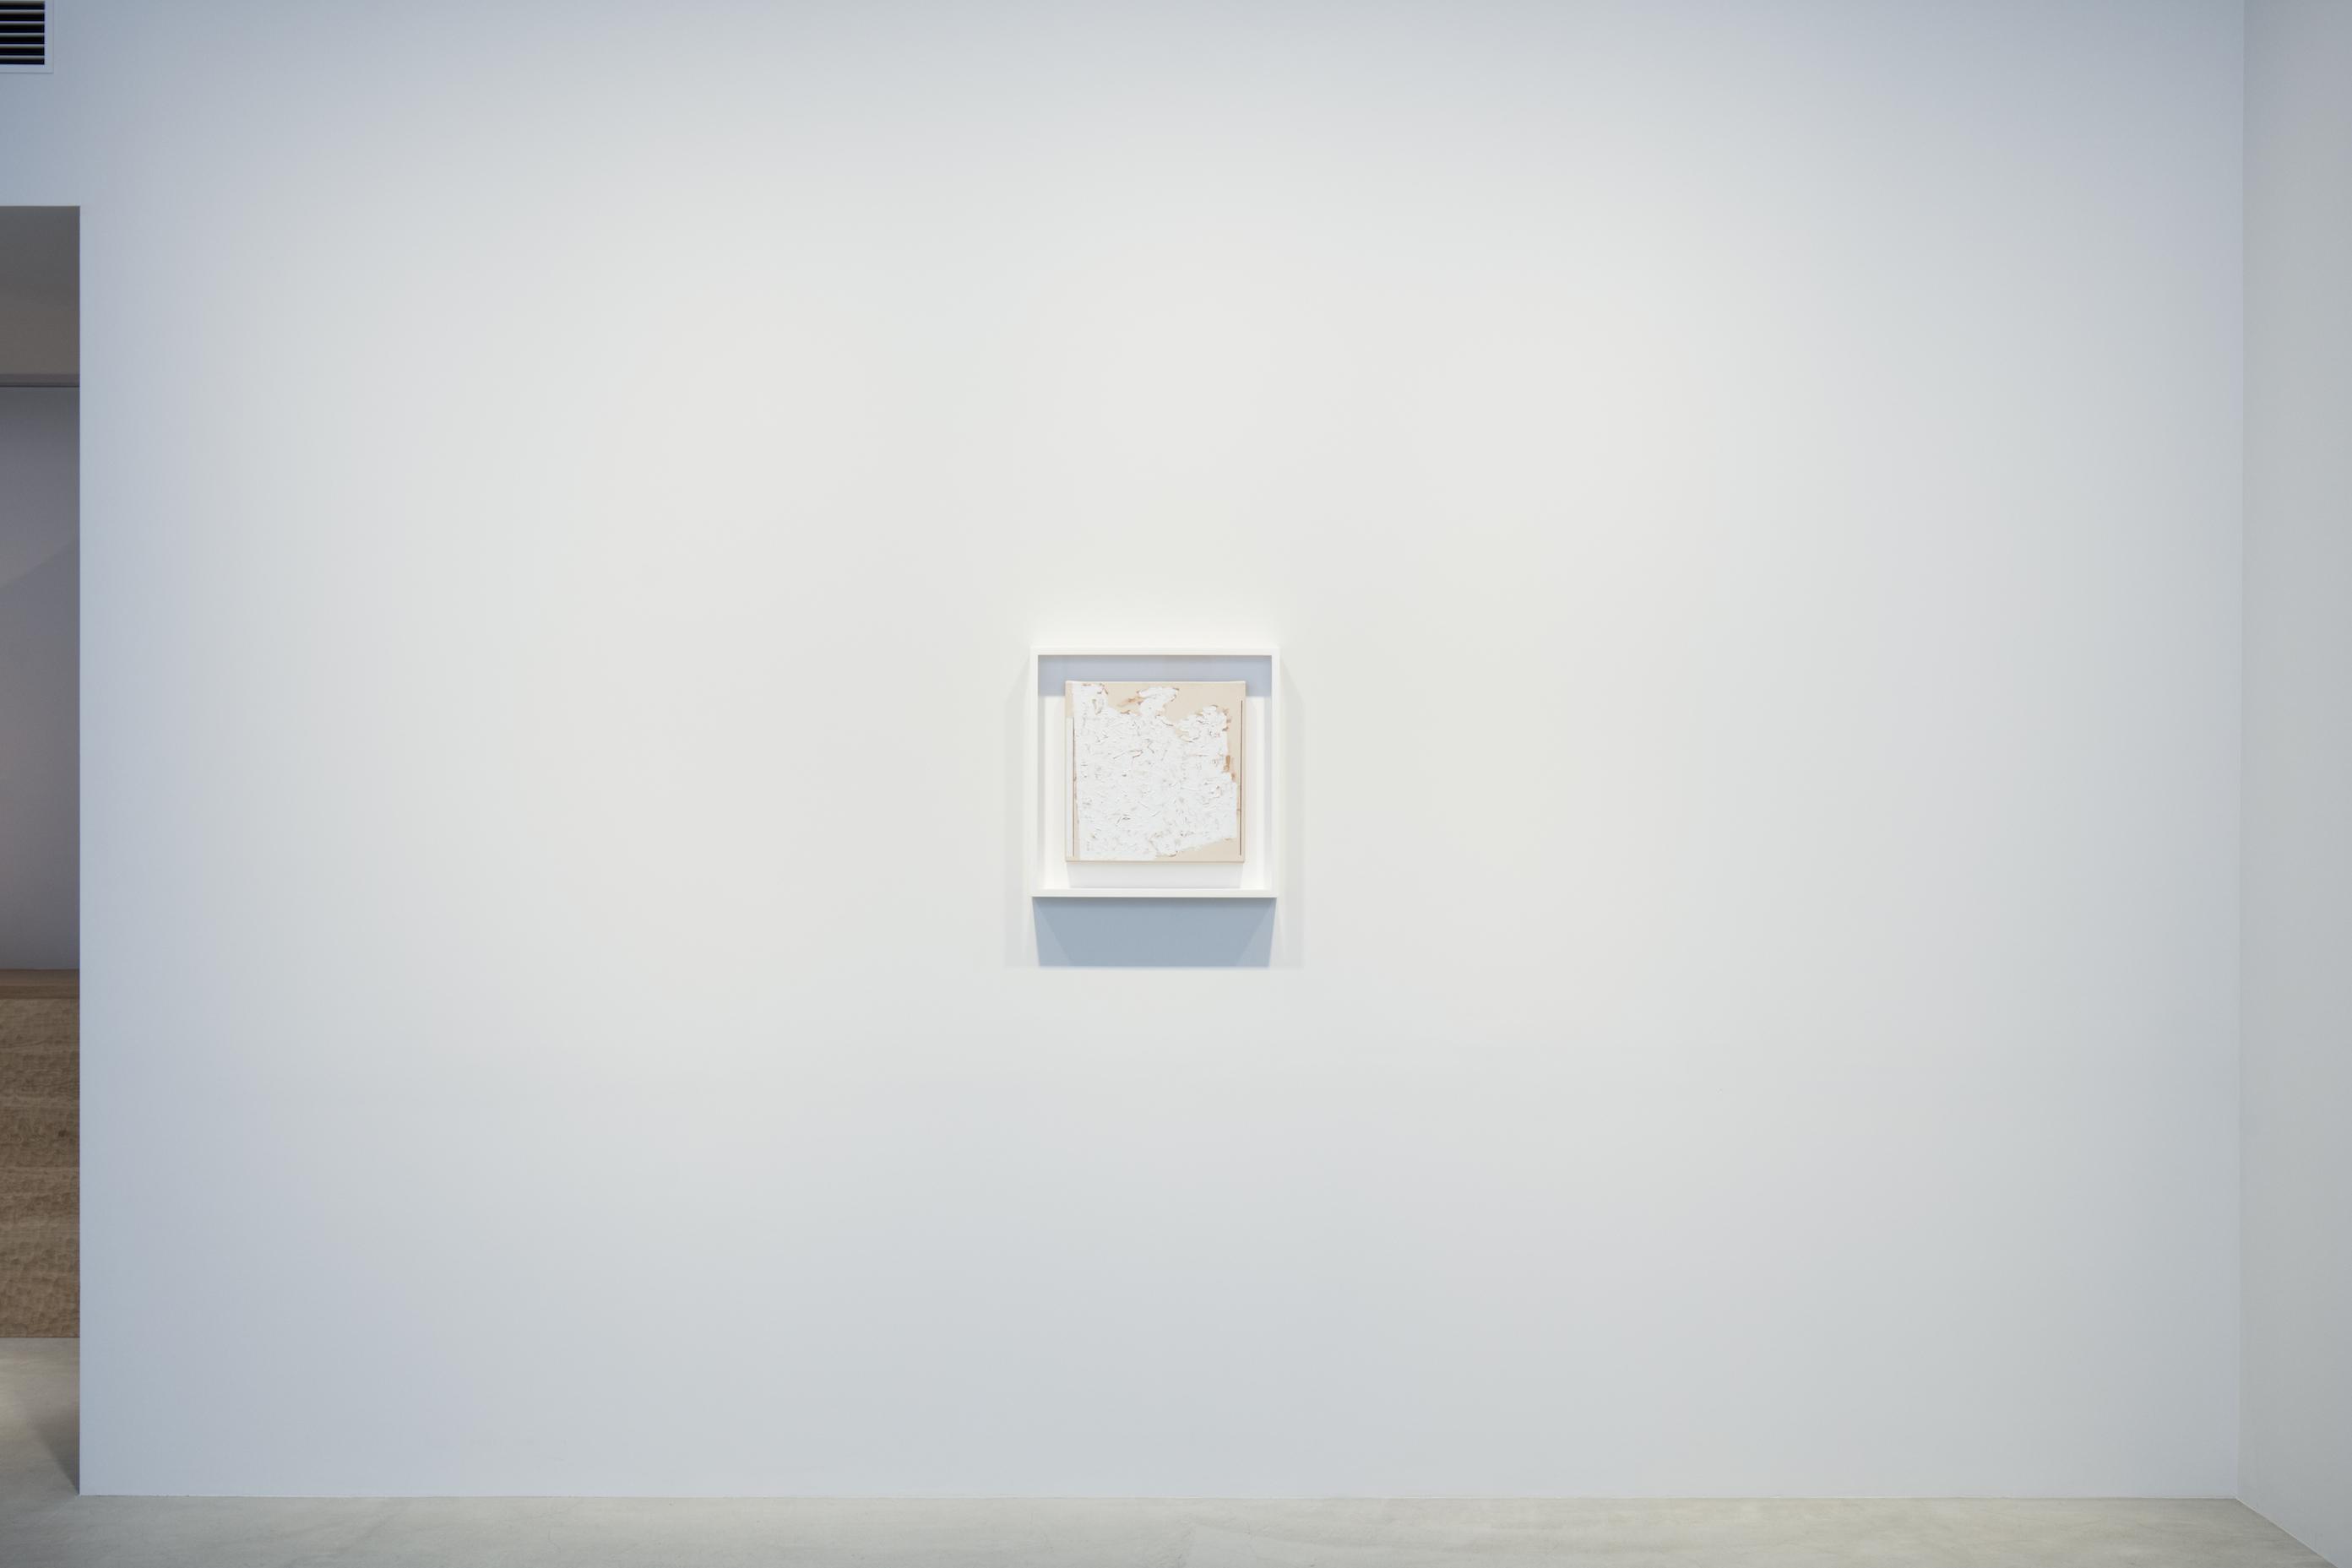 Photograph 3 from Robert Ryman exhibition.